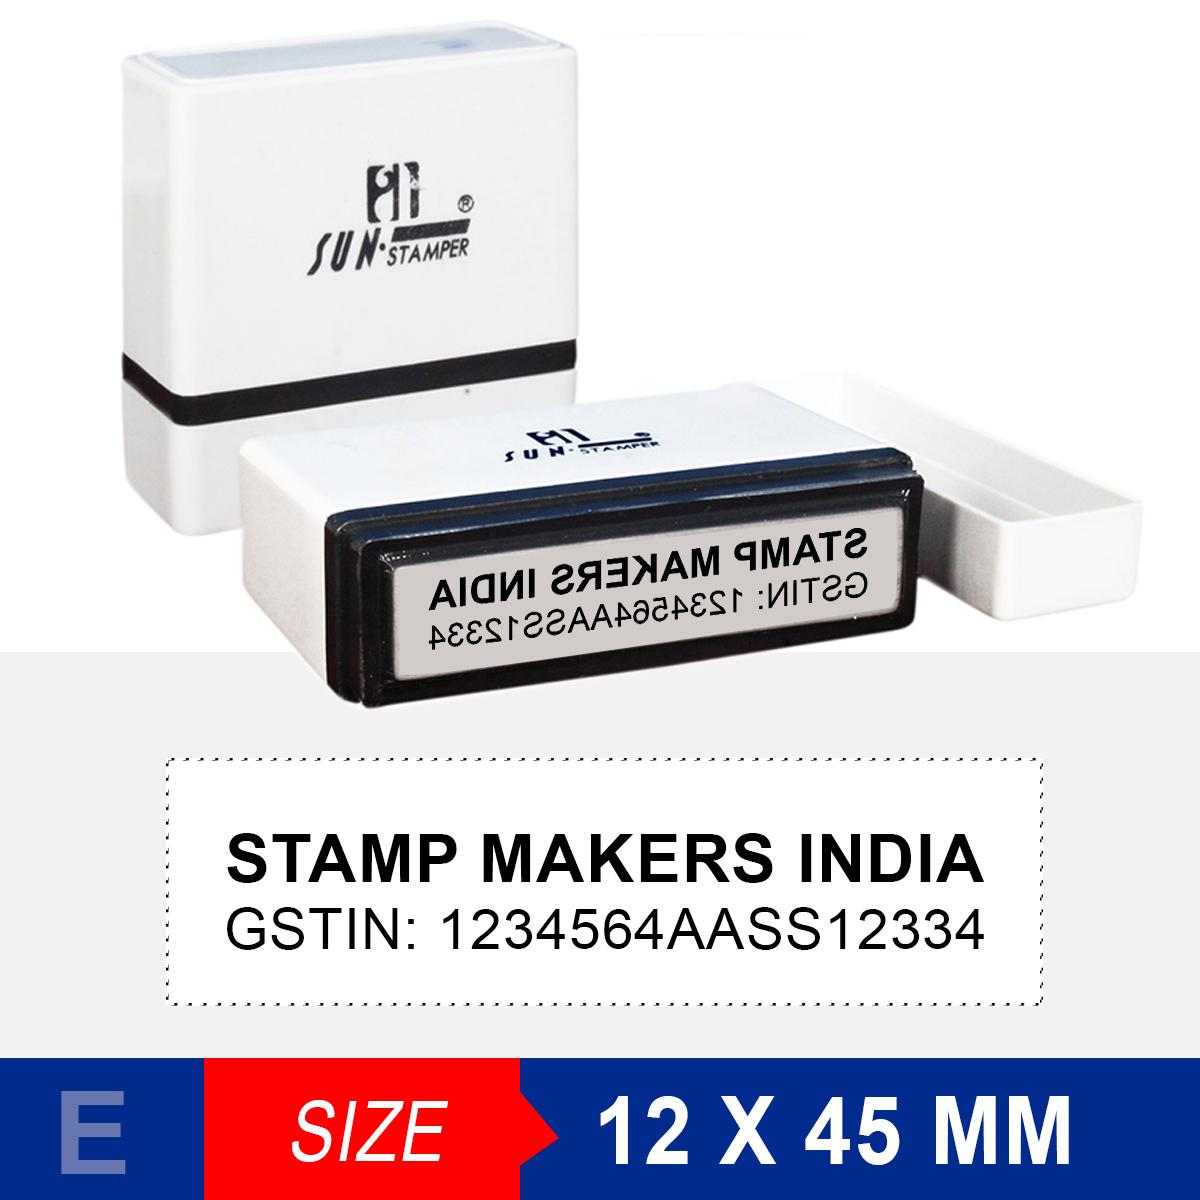 Gst Stamp 12x45 Mm Sun Stamp Online Stamp Makers